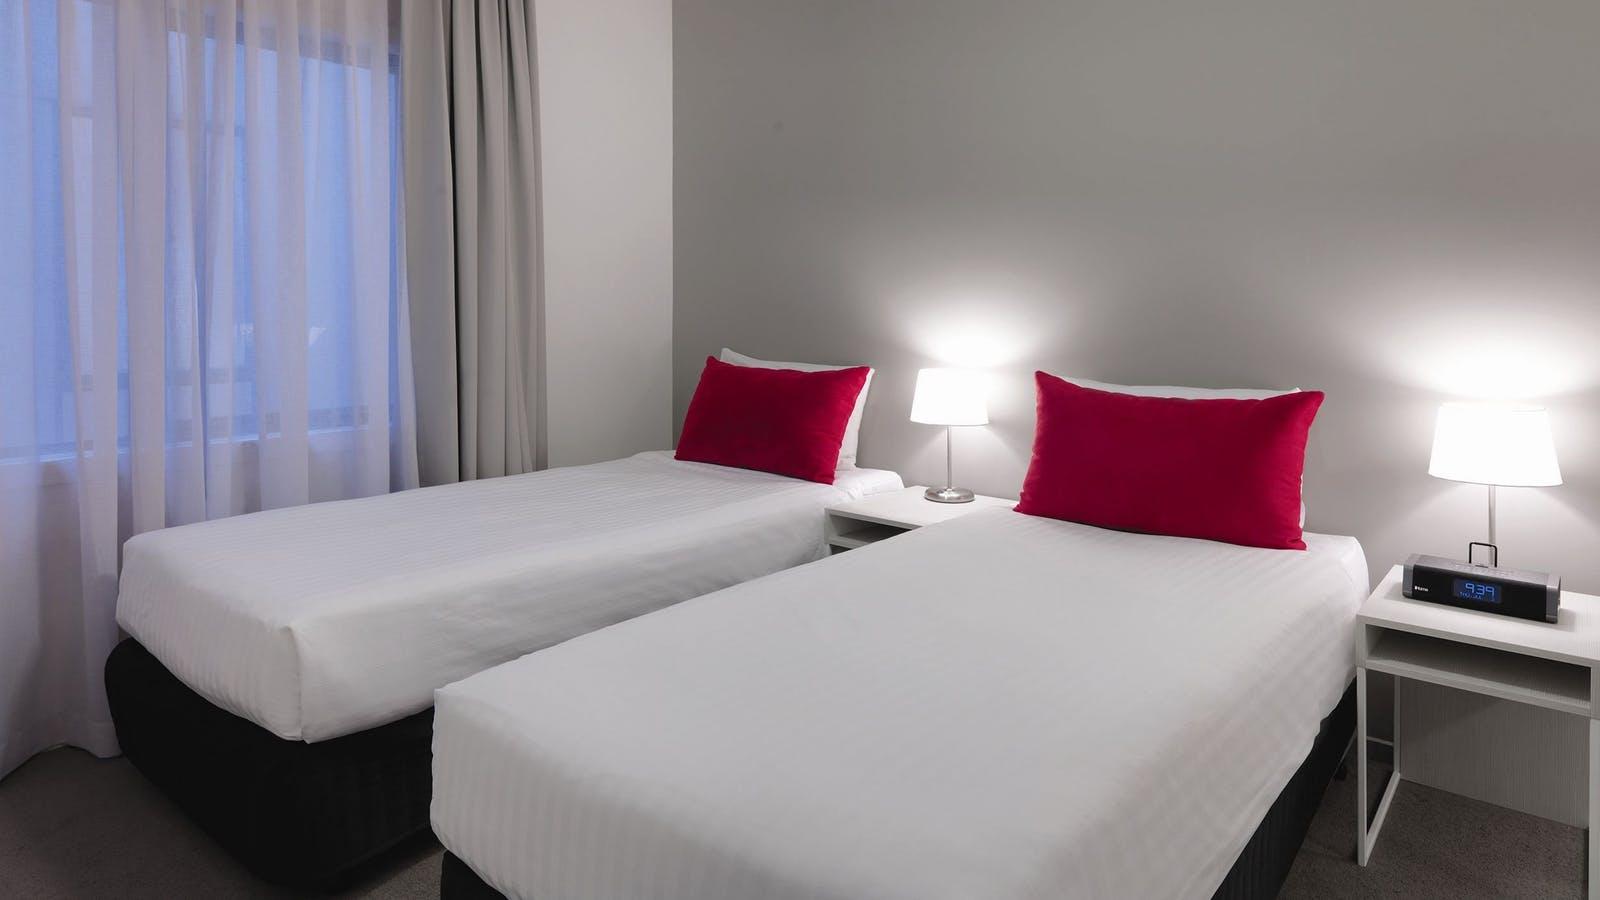 Adina Apartment Hotel St Kilda - Apartment Bedroom Twin